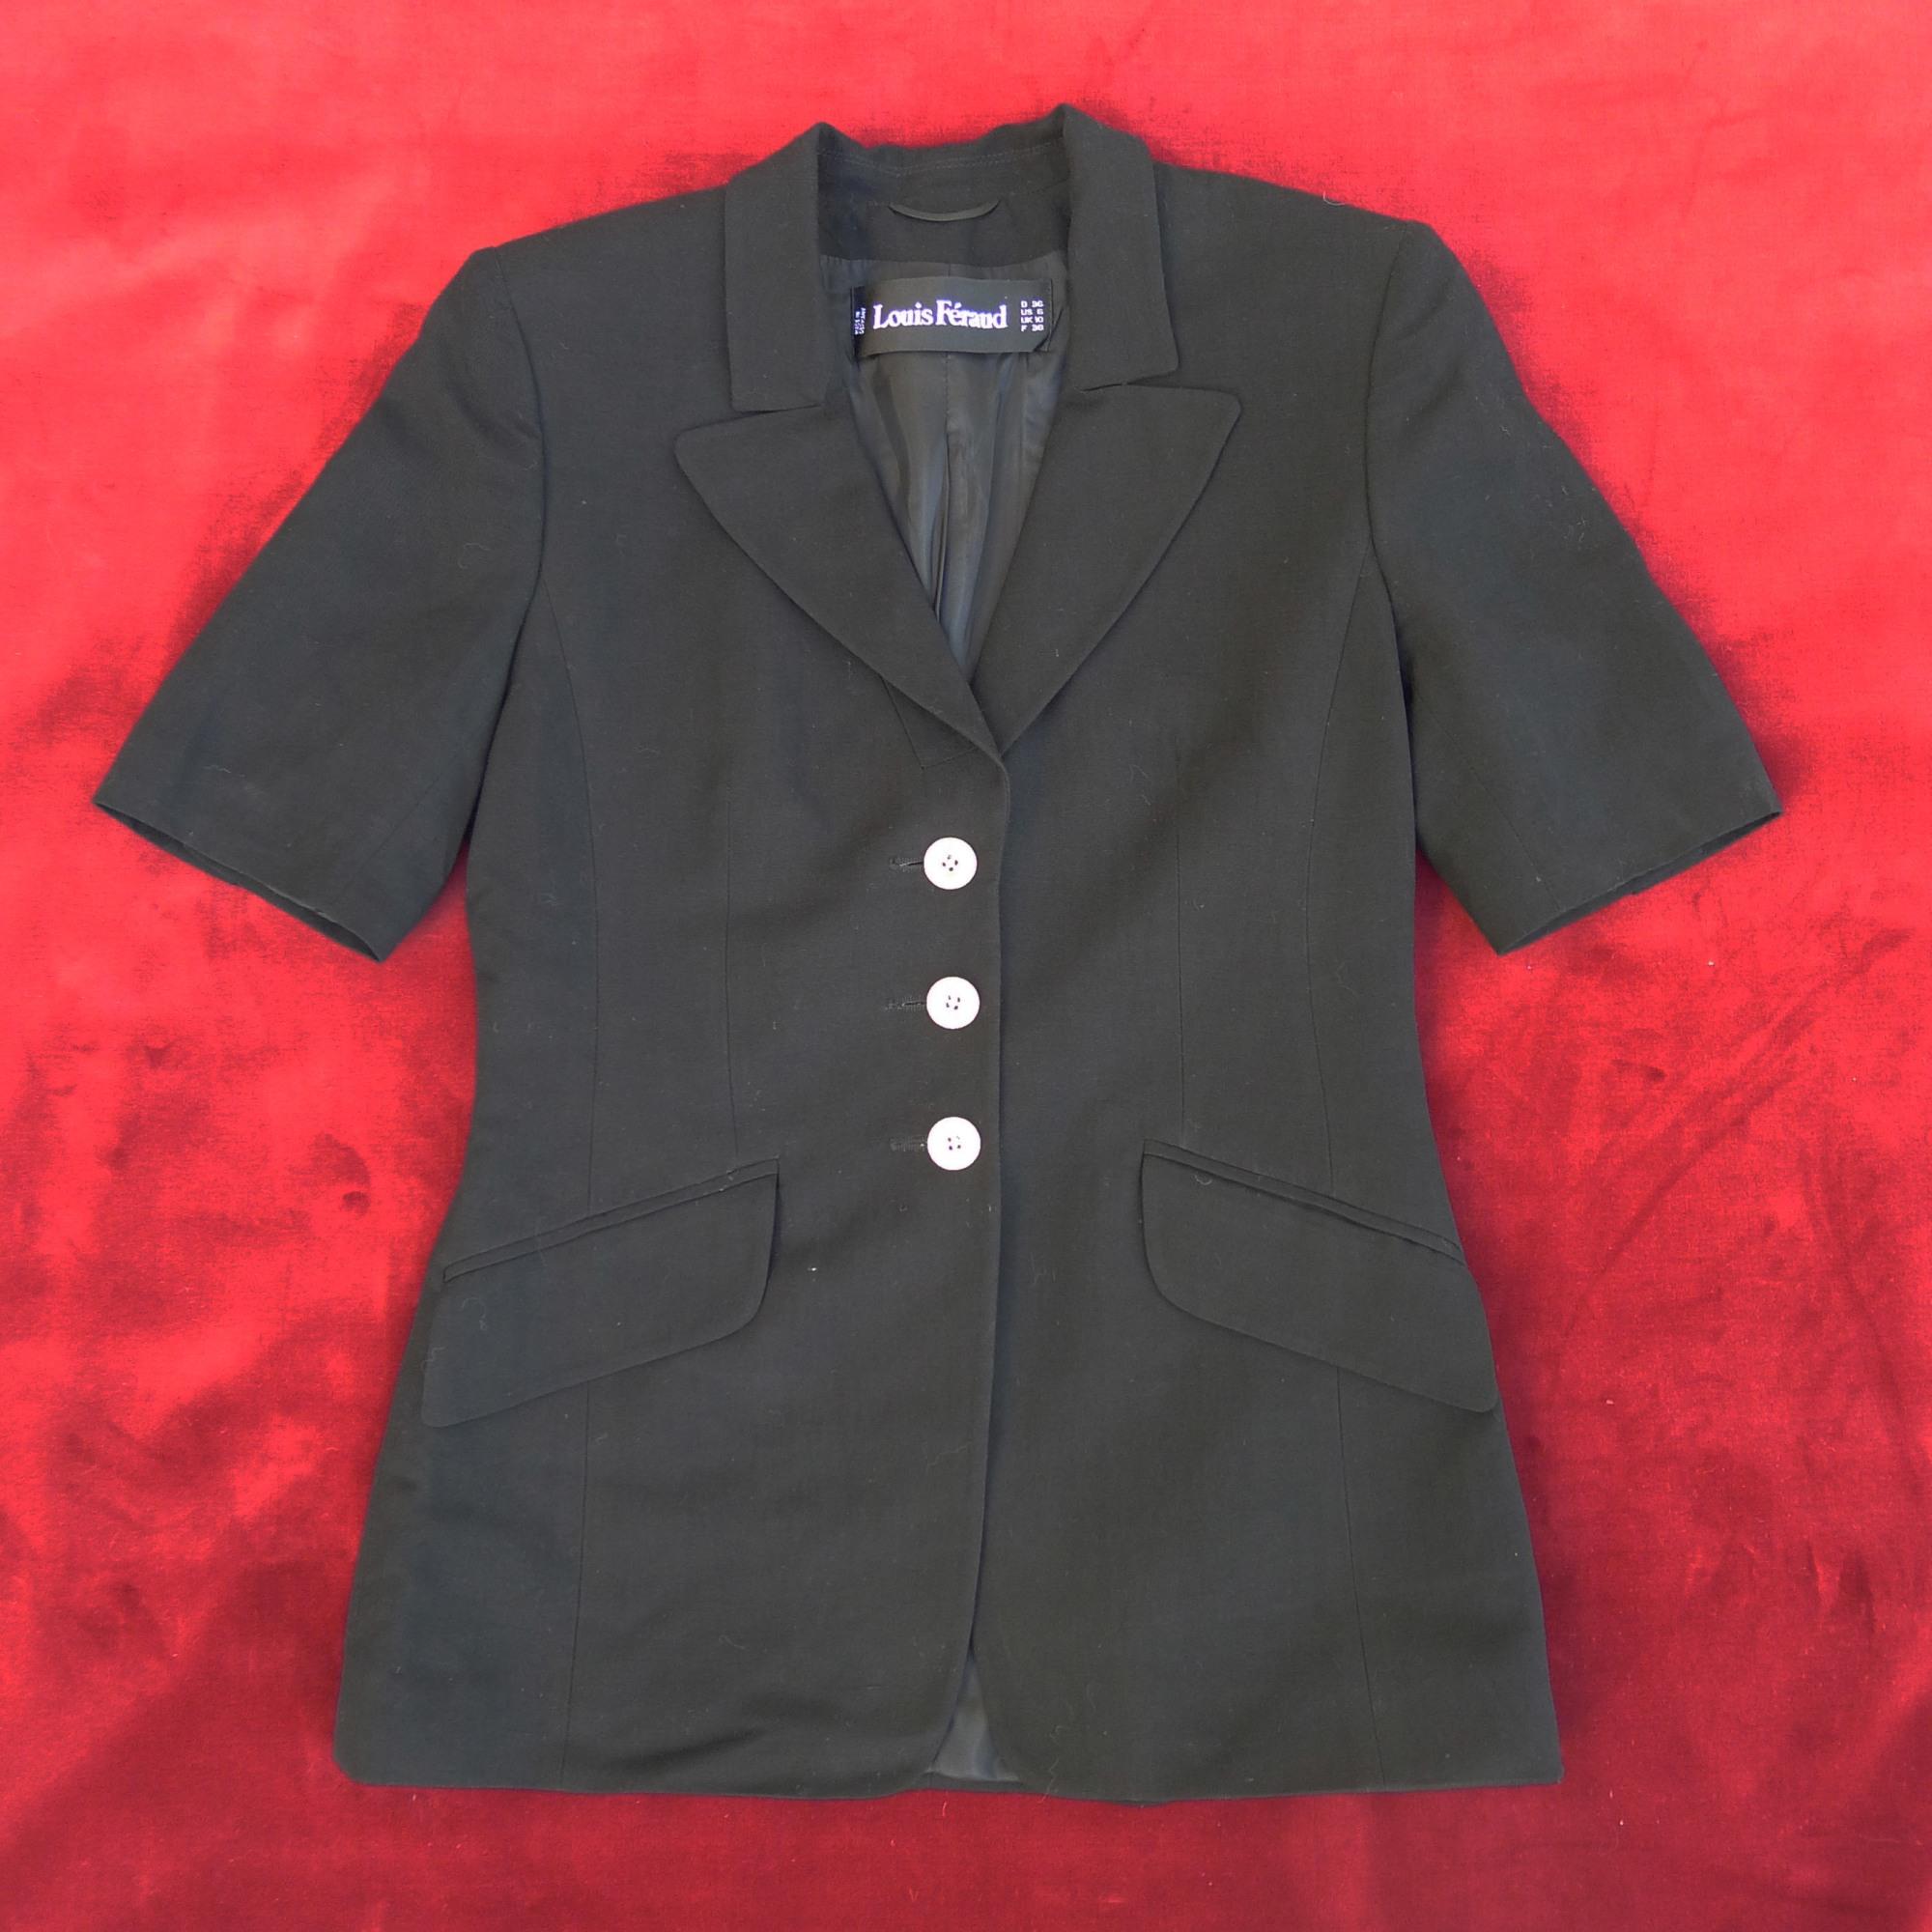 Blazer, veste tailleur LOUIS FÉRAUD Noir